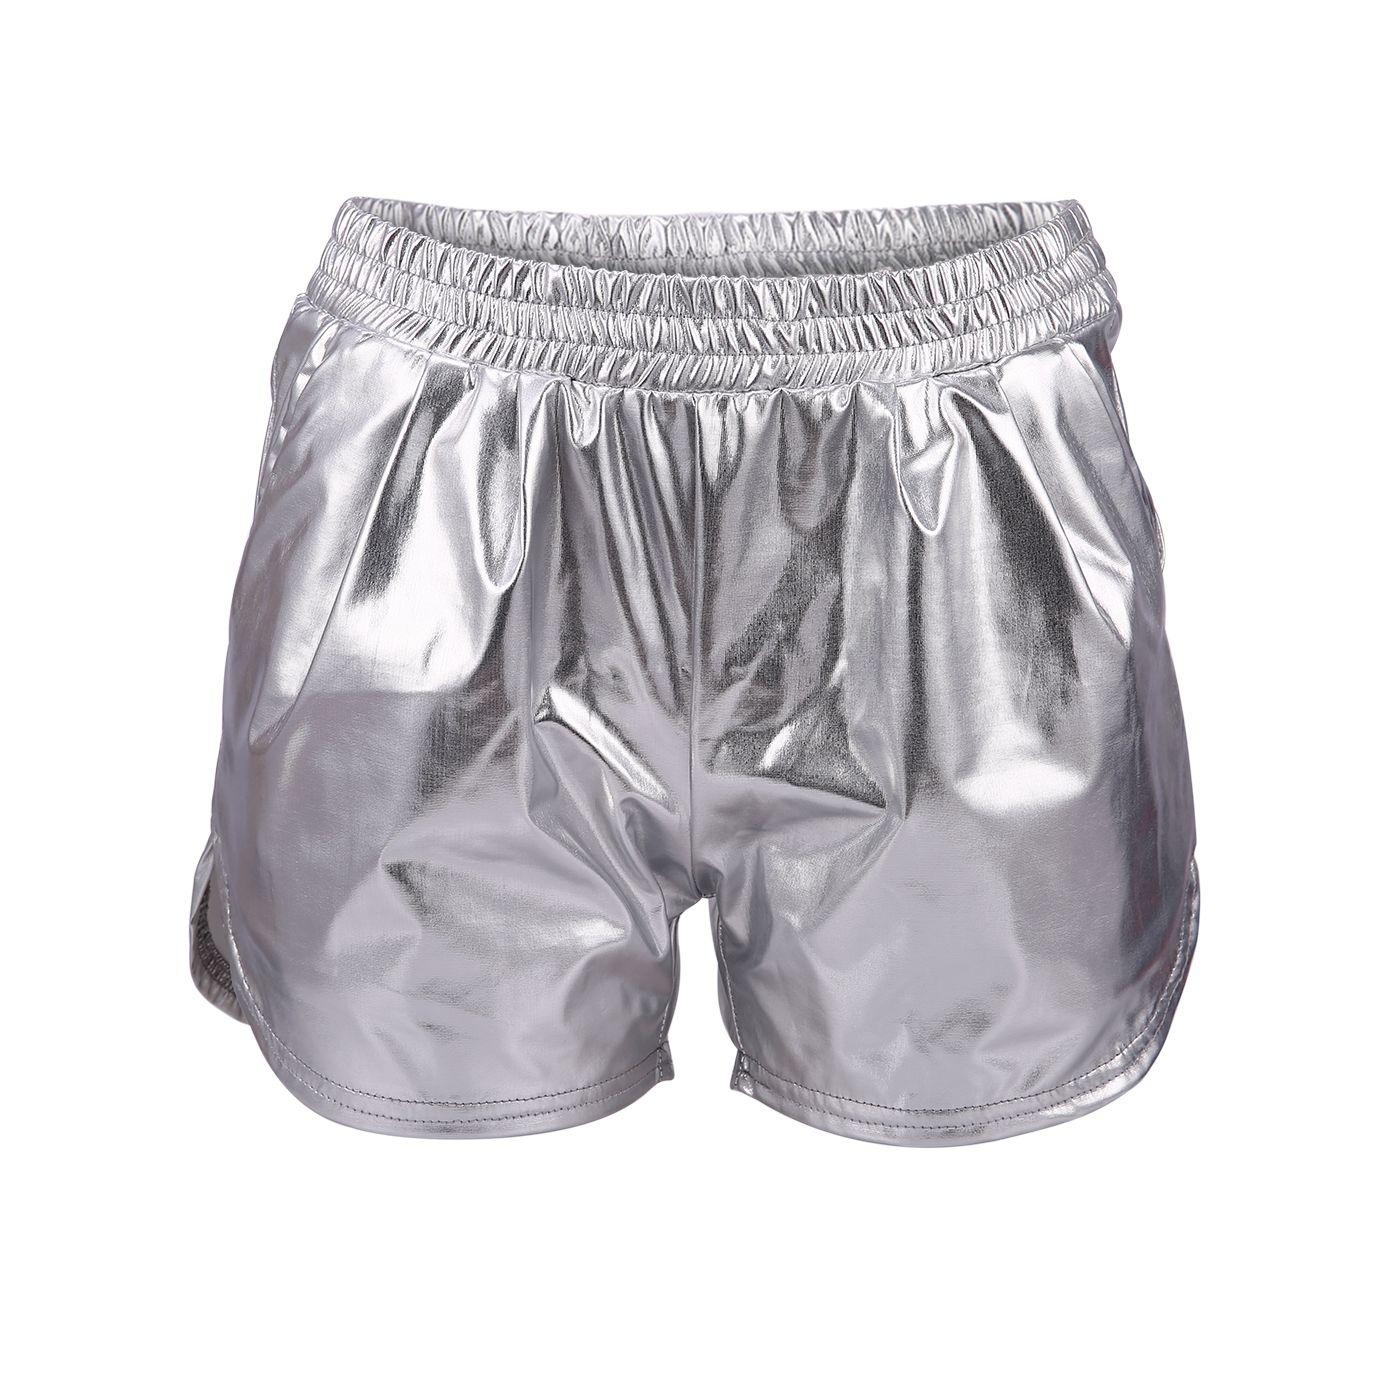 84122b371981e HDE Women's Hot Shorts Loose Shiny Metallic Yoga Pants (Silver, Medium)# Shorts, #Loose, #Hot